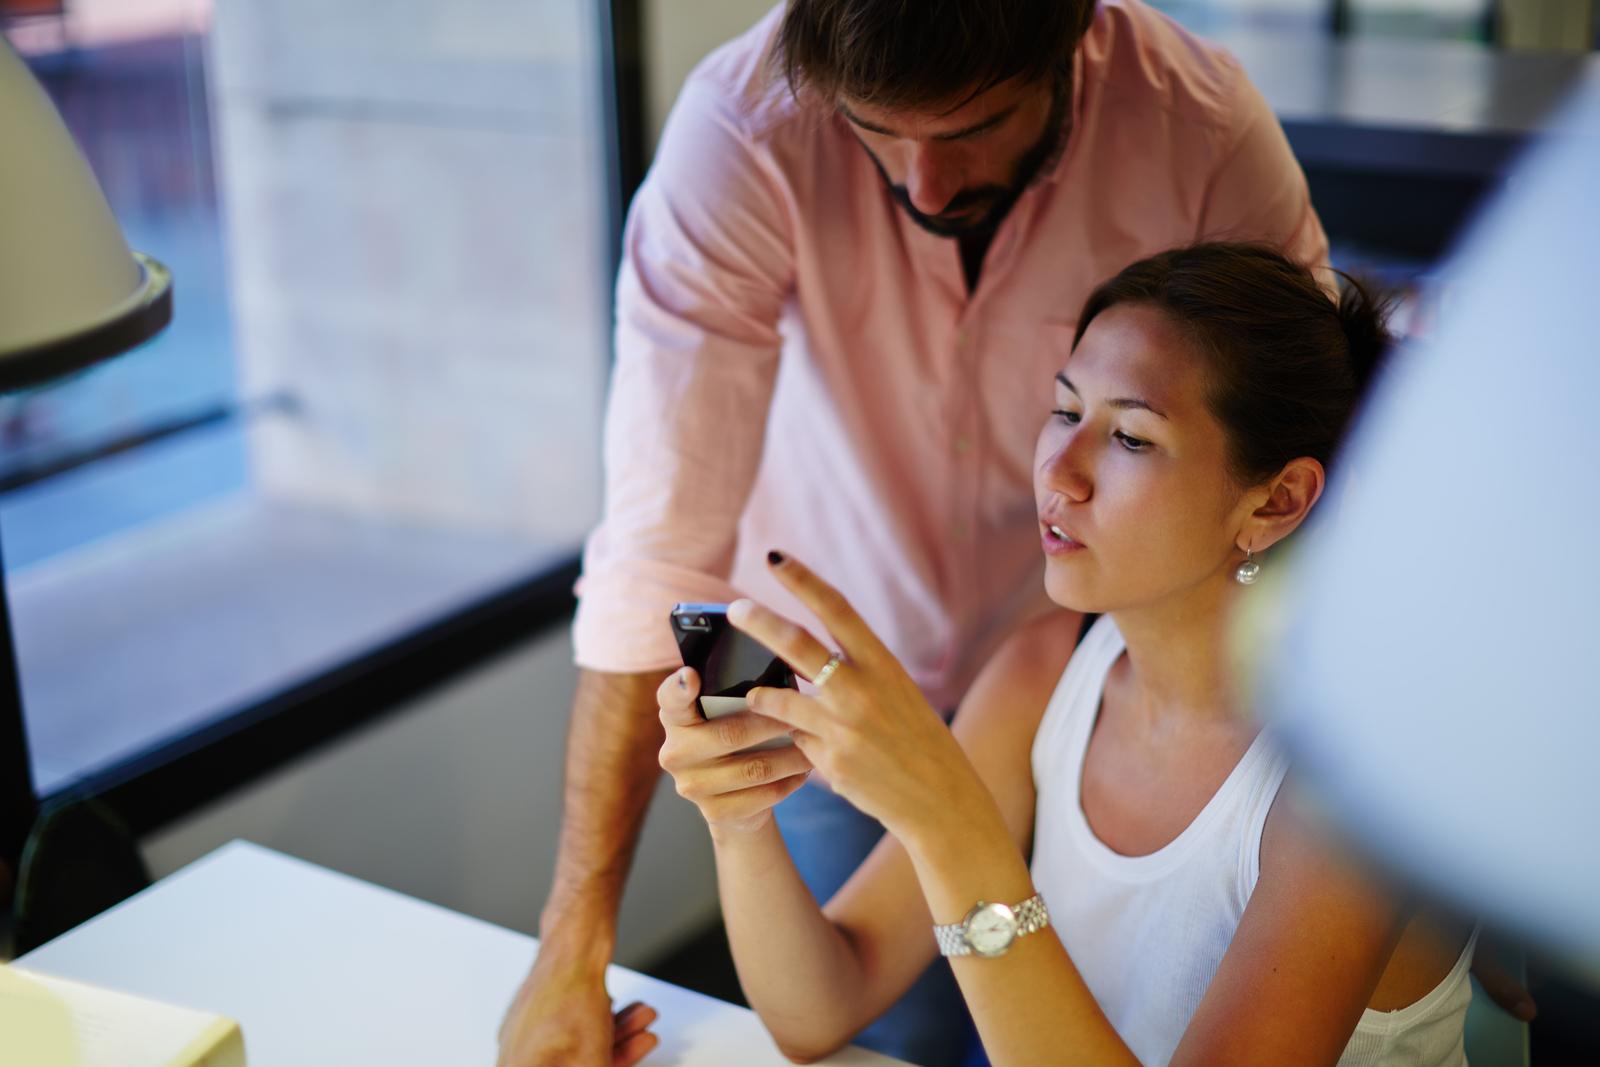 Affinity-technology-partners-nashville-tn-man-woman